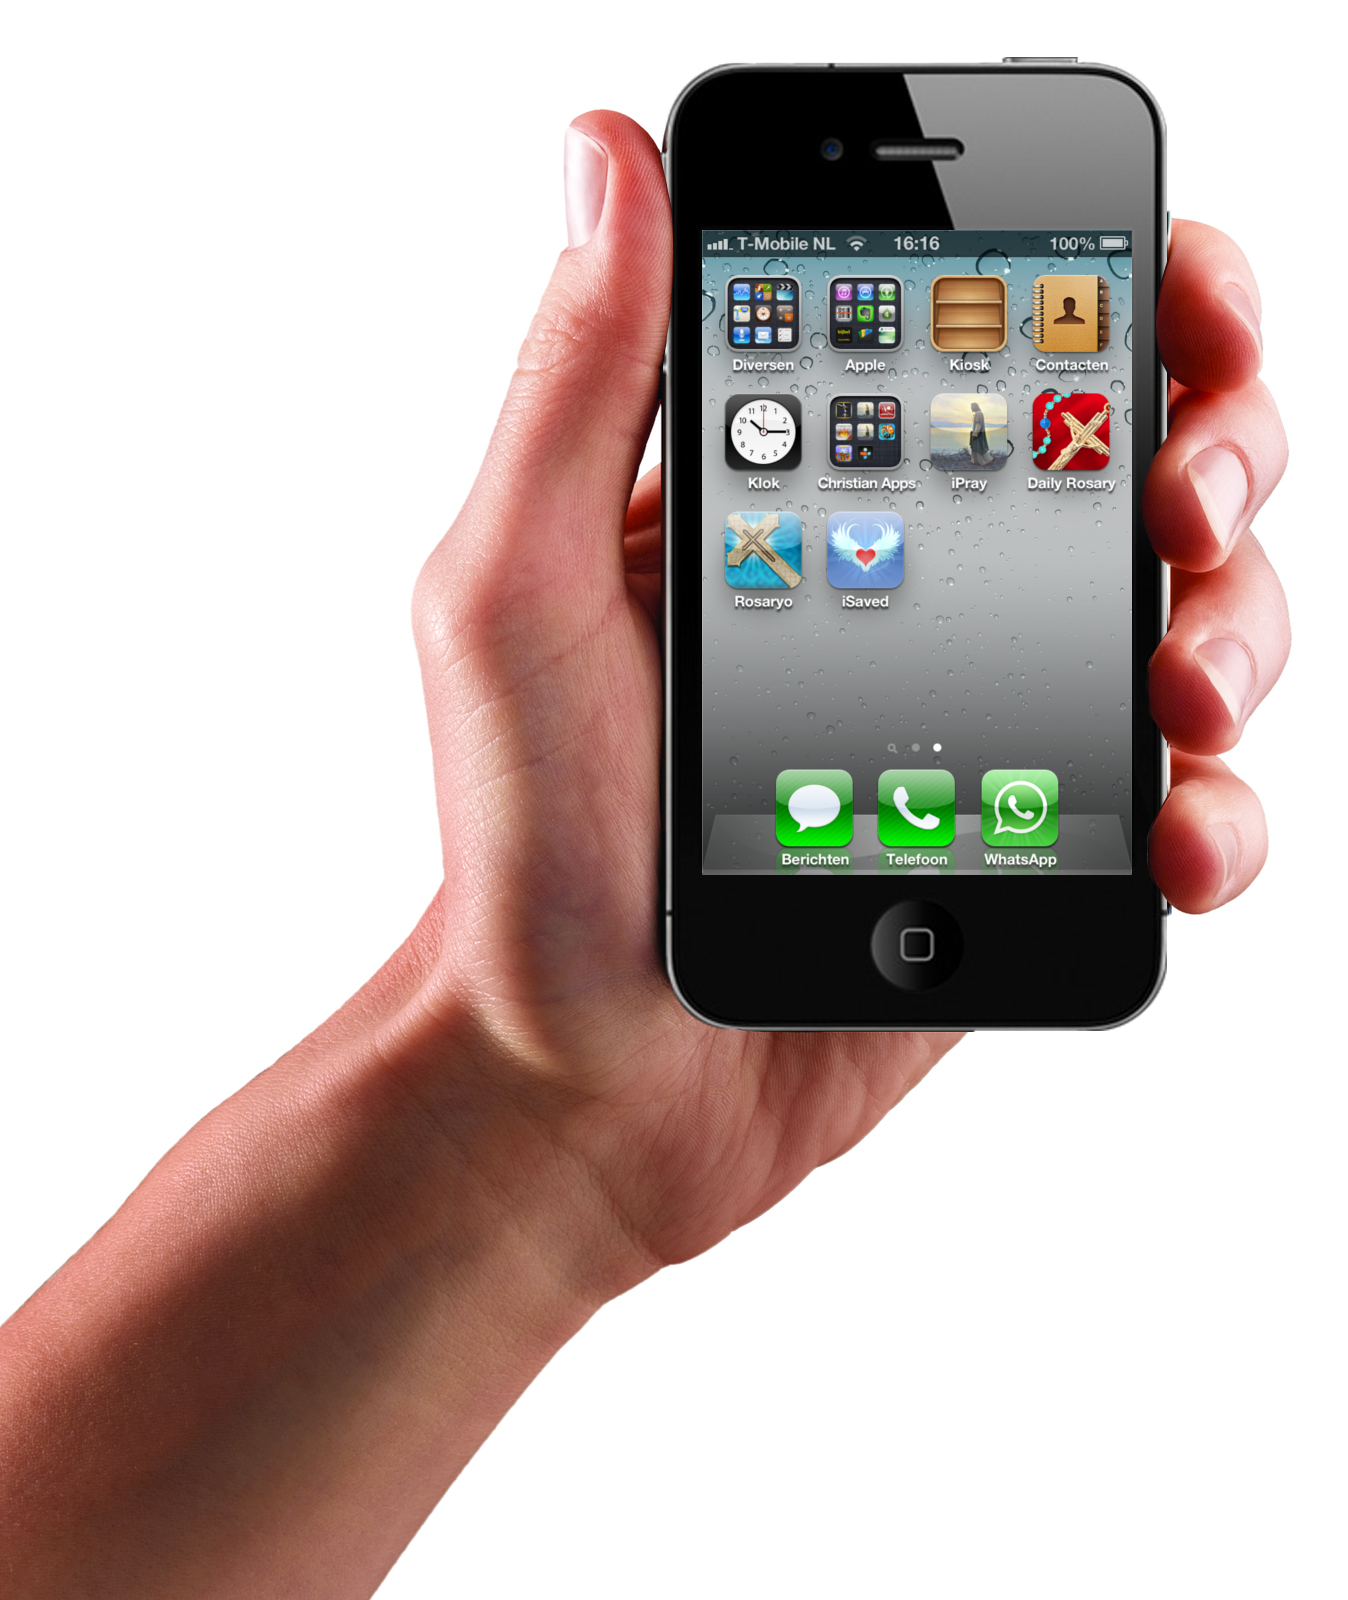 iphone4hand